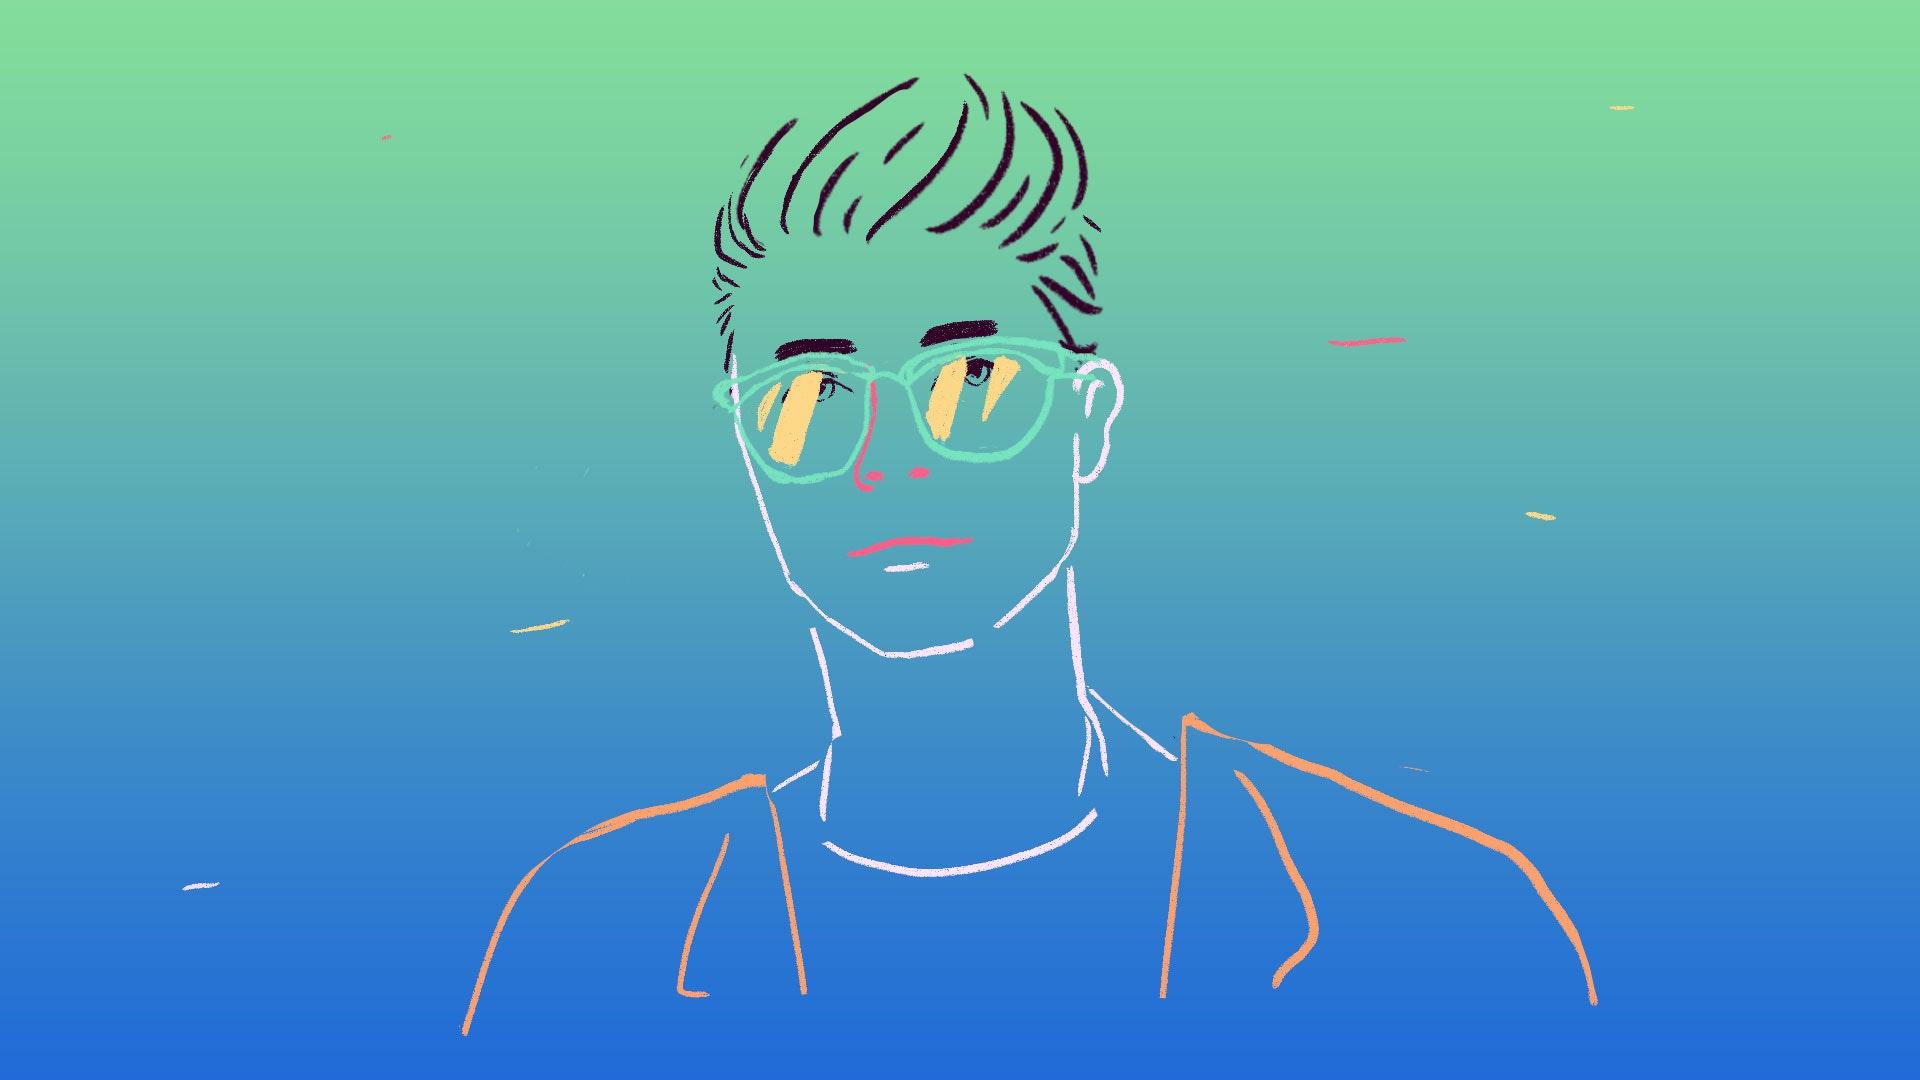 Man line drawing